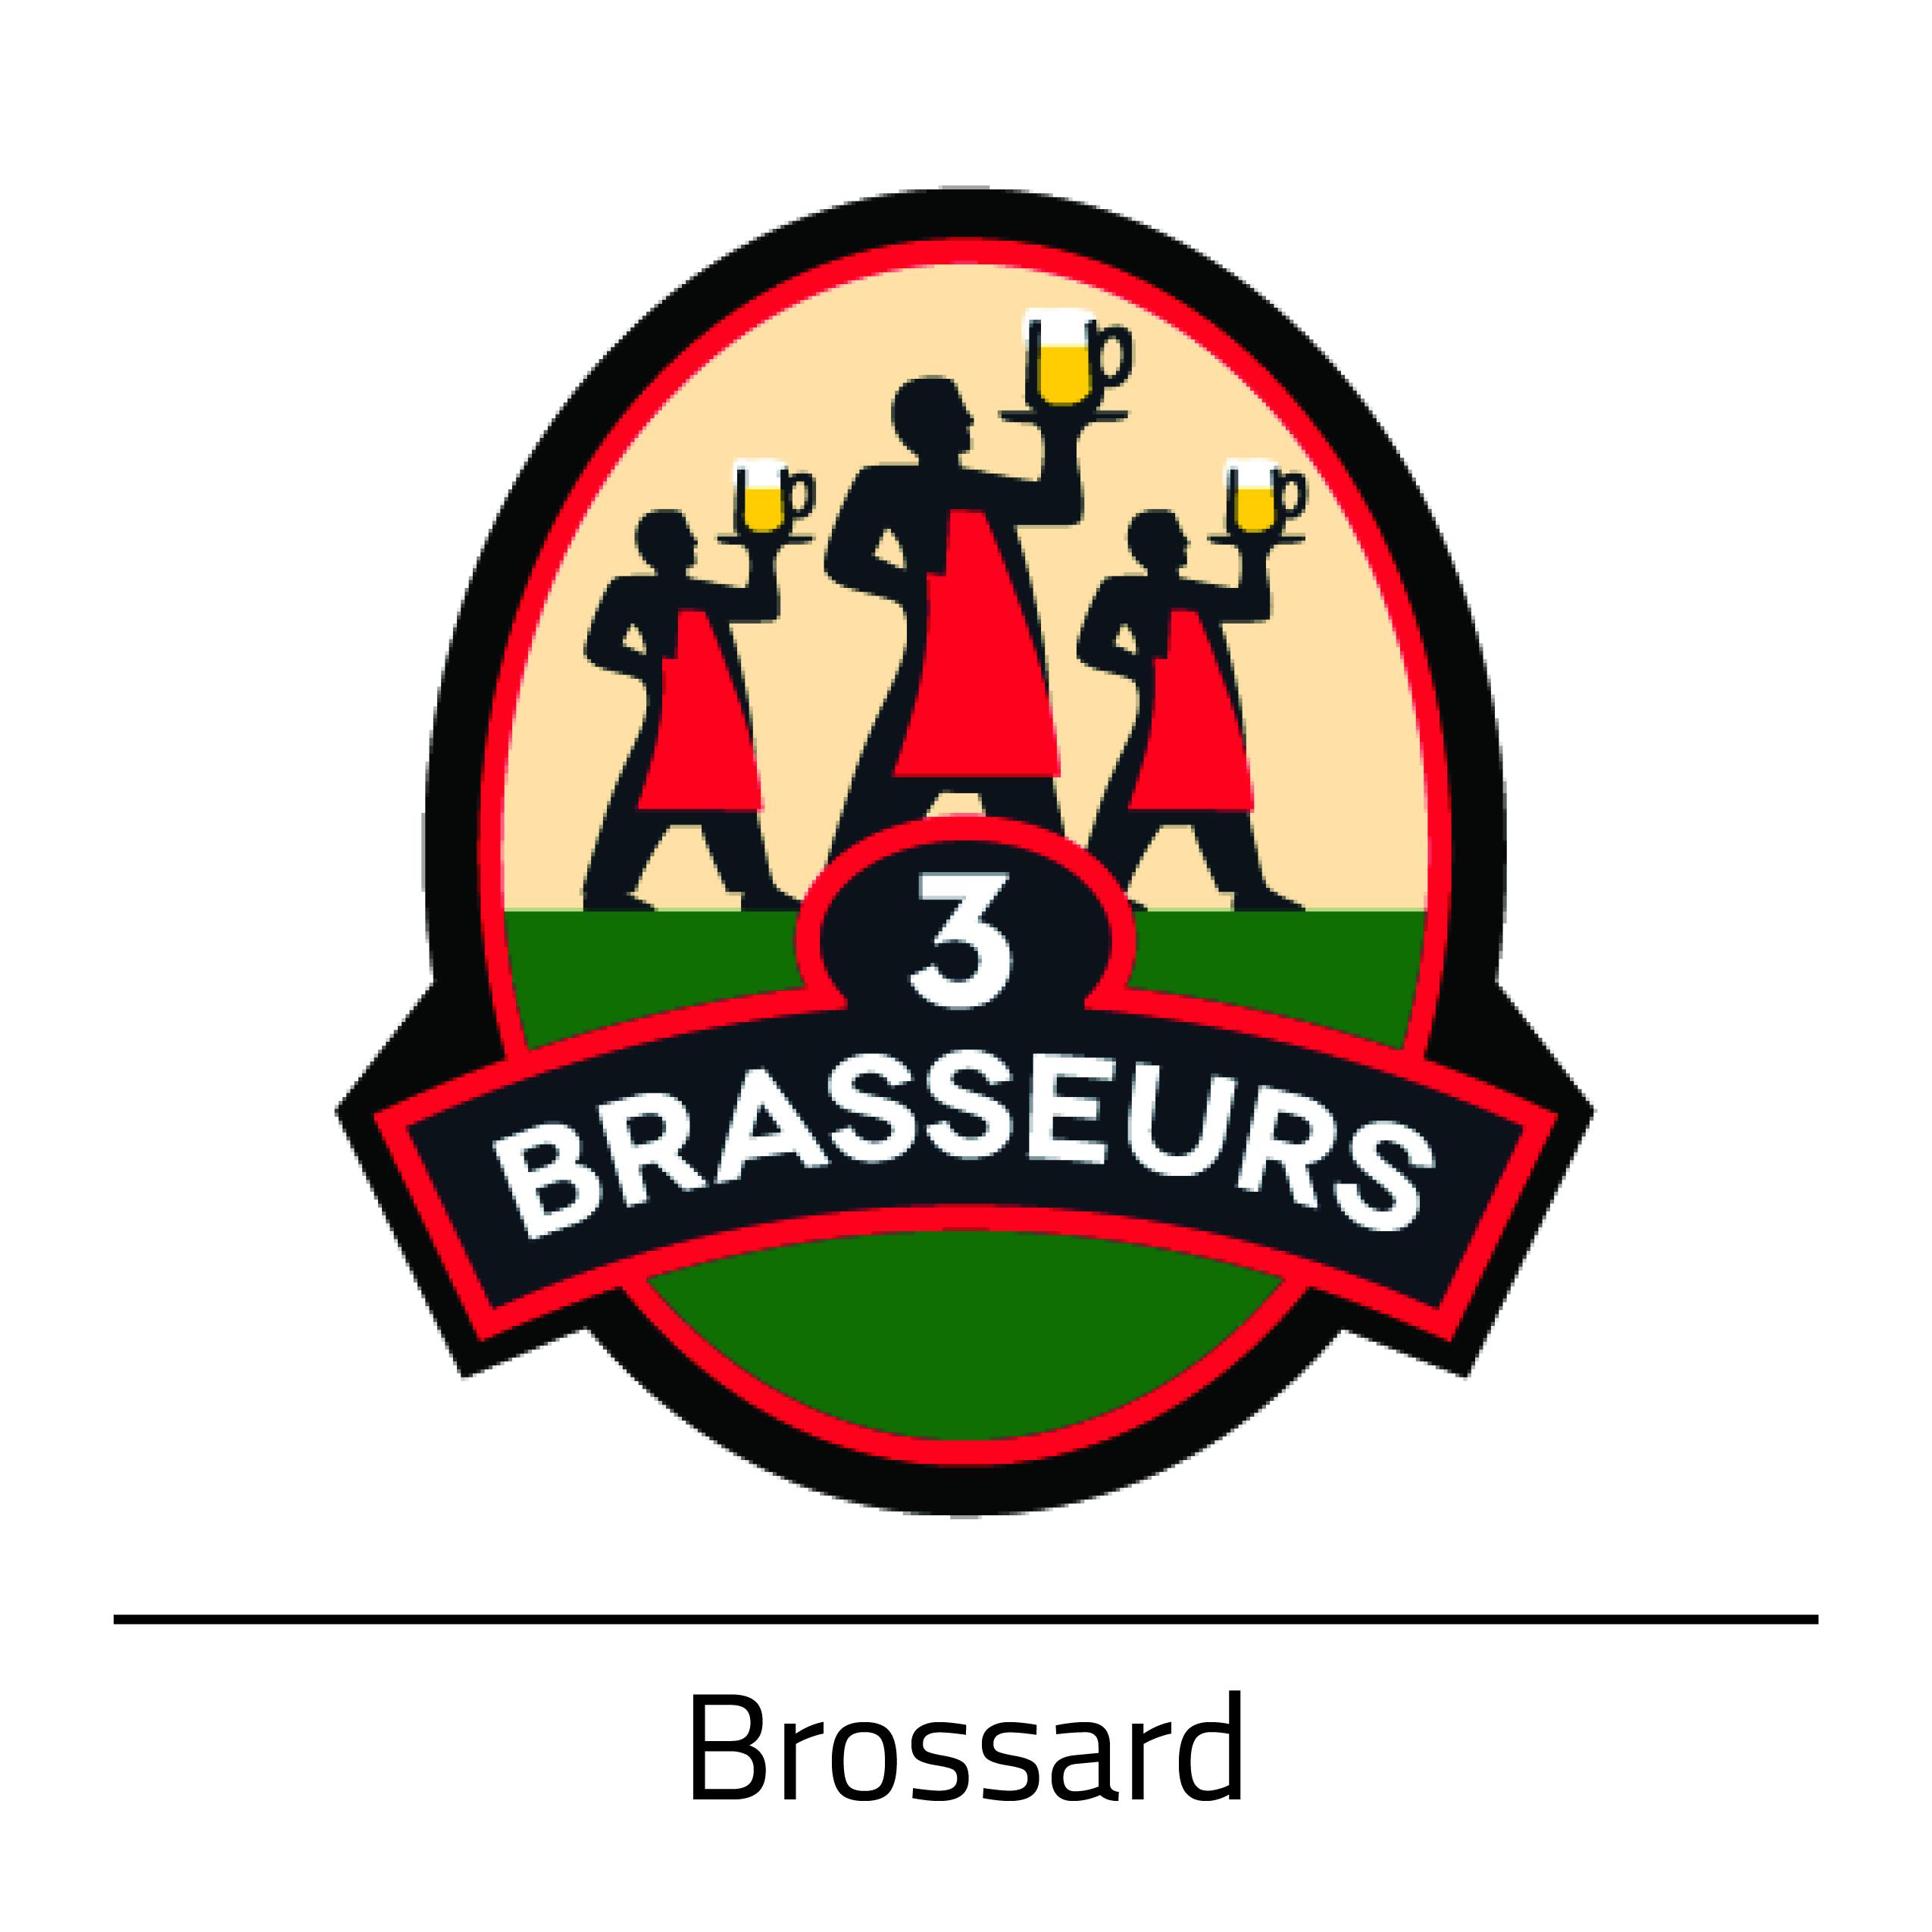 3 Brasseurs Brossard